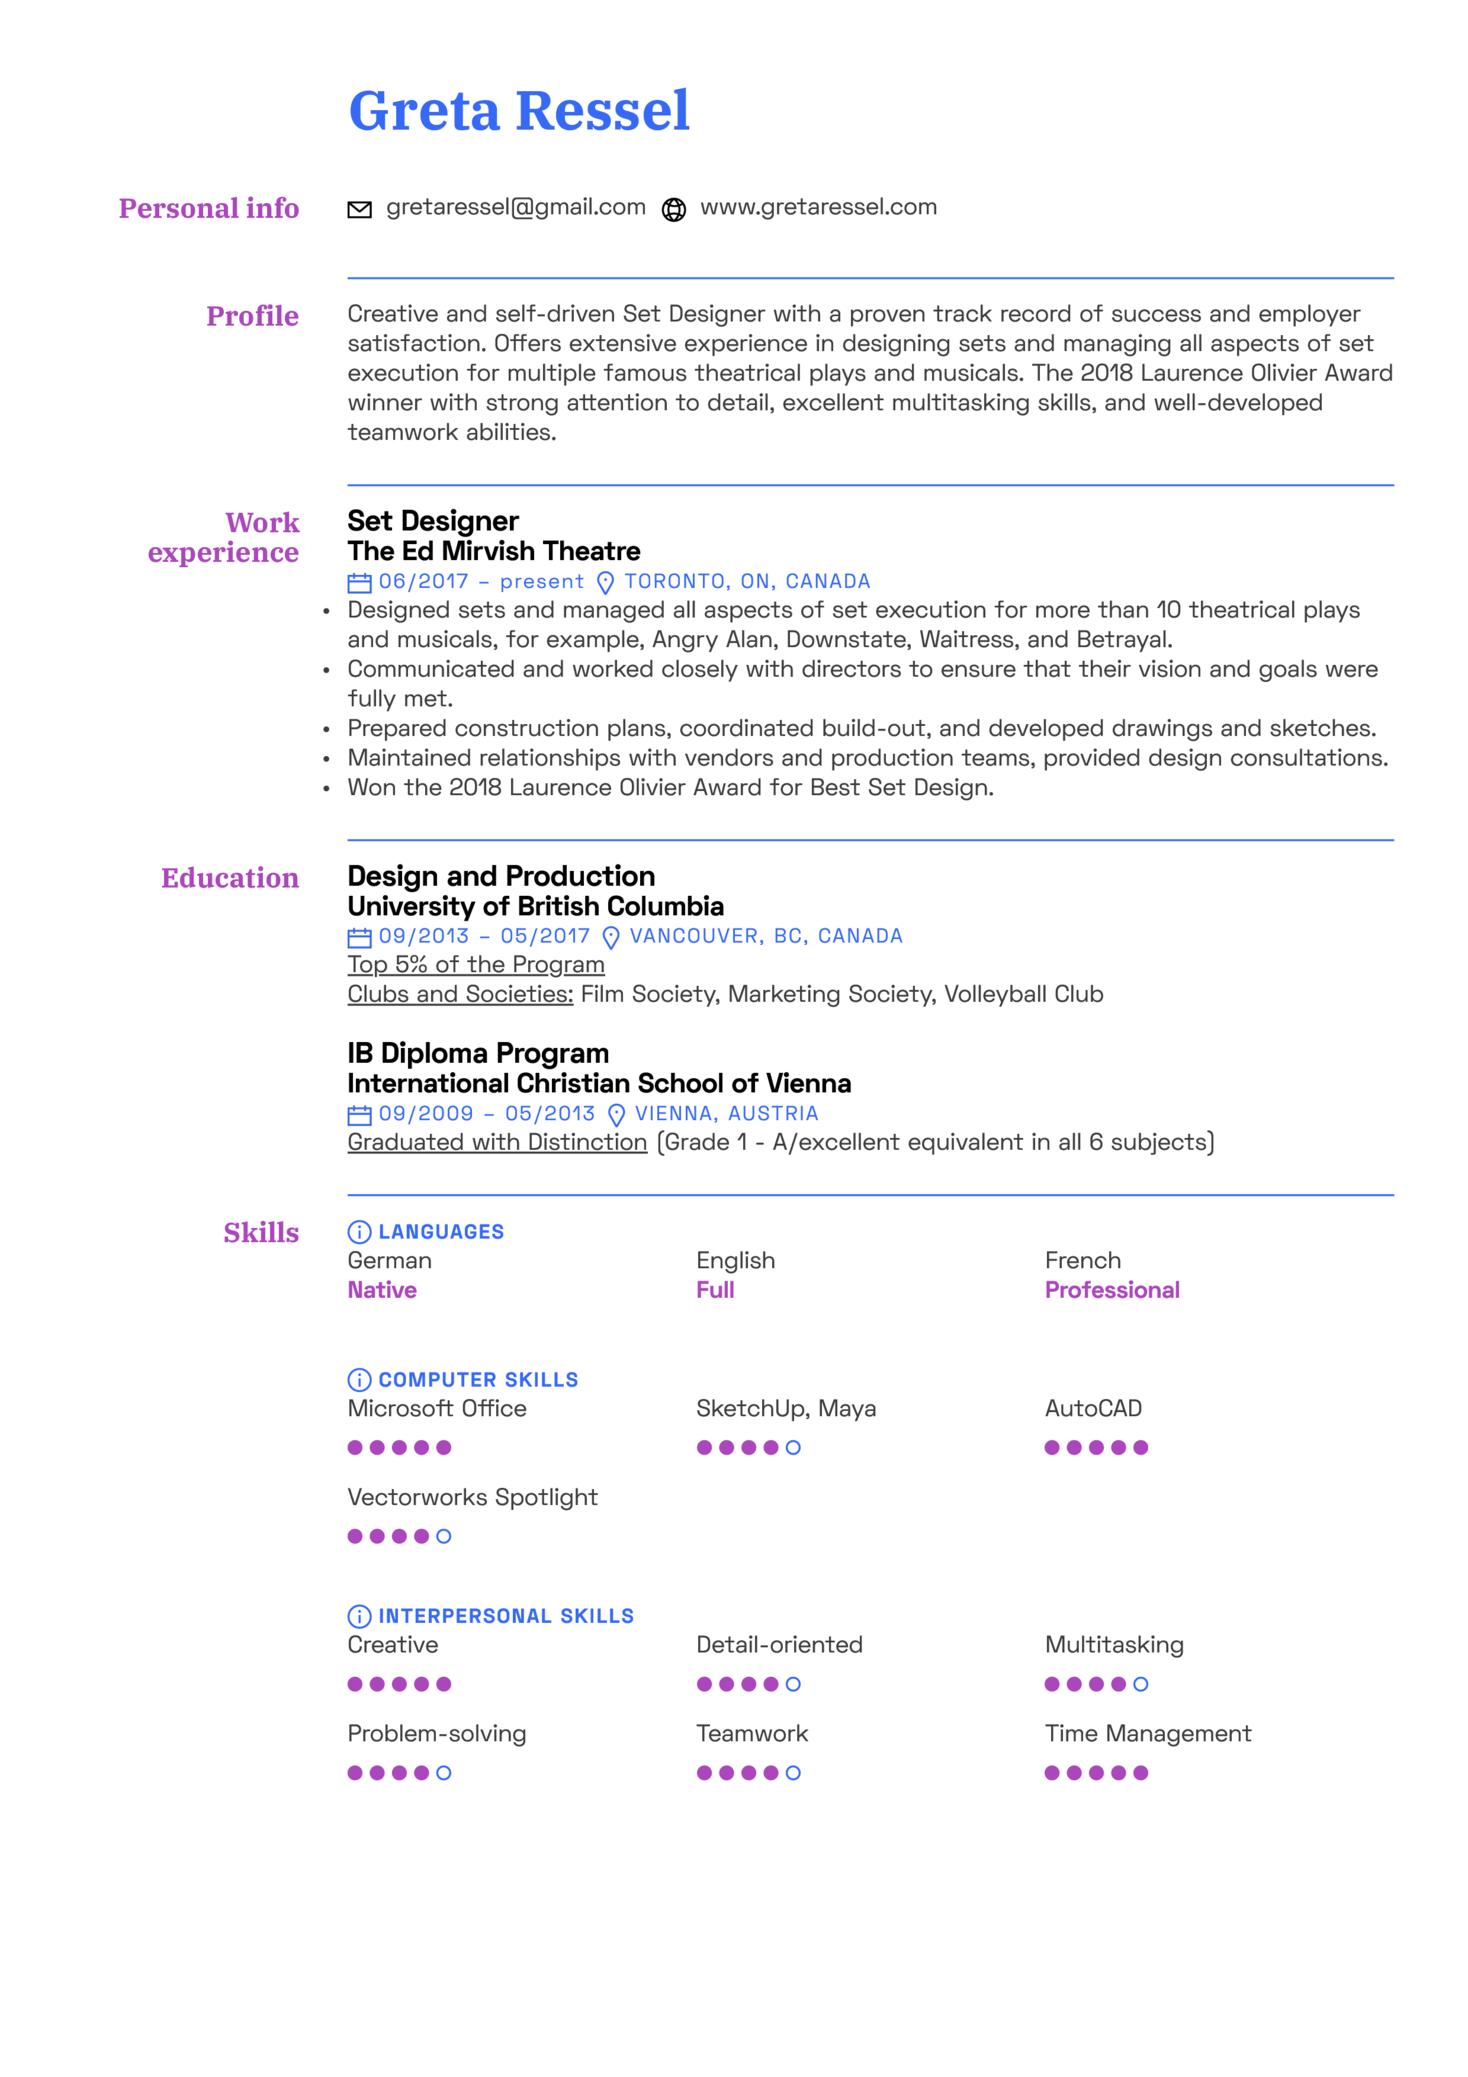 Set Designer Resume Template (Parte 1)